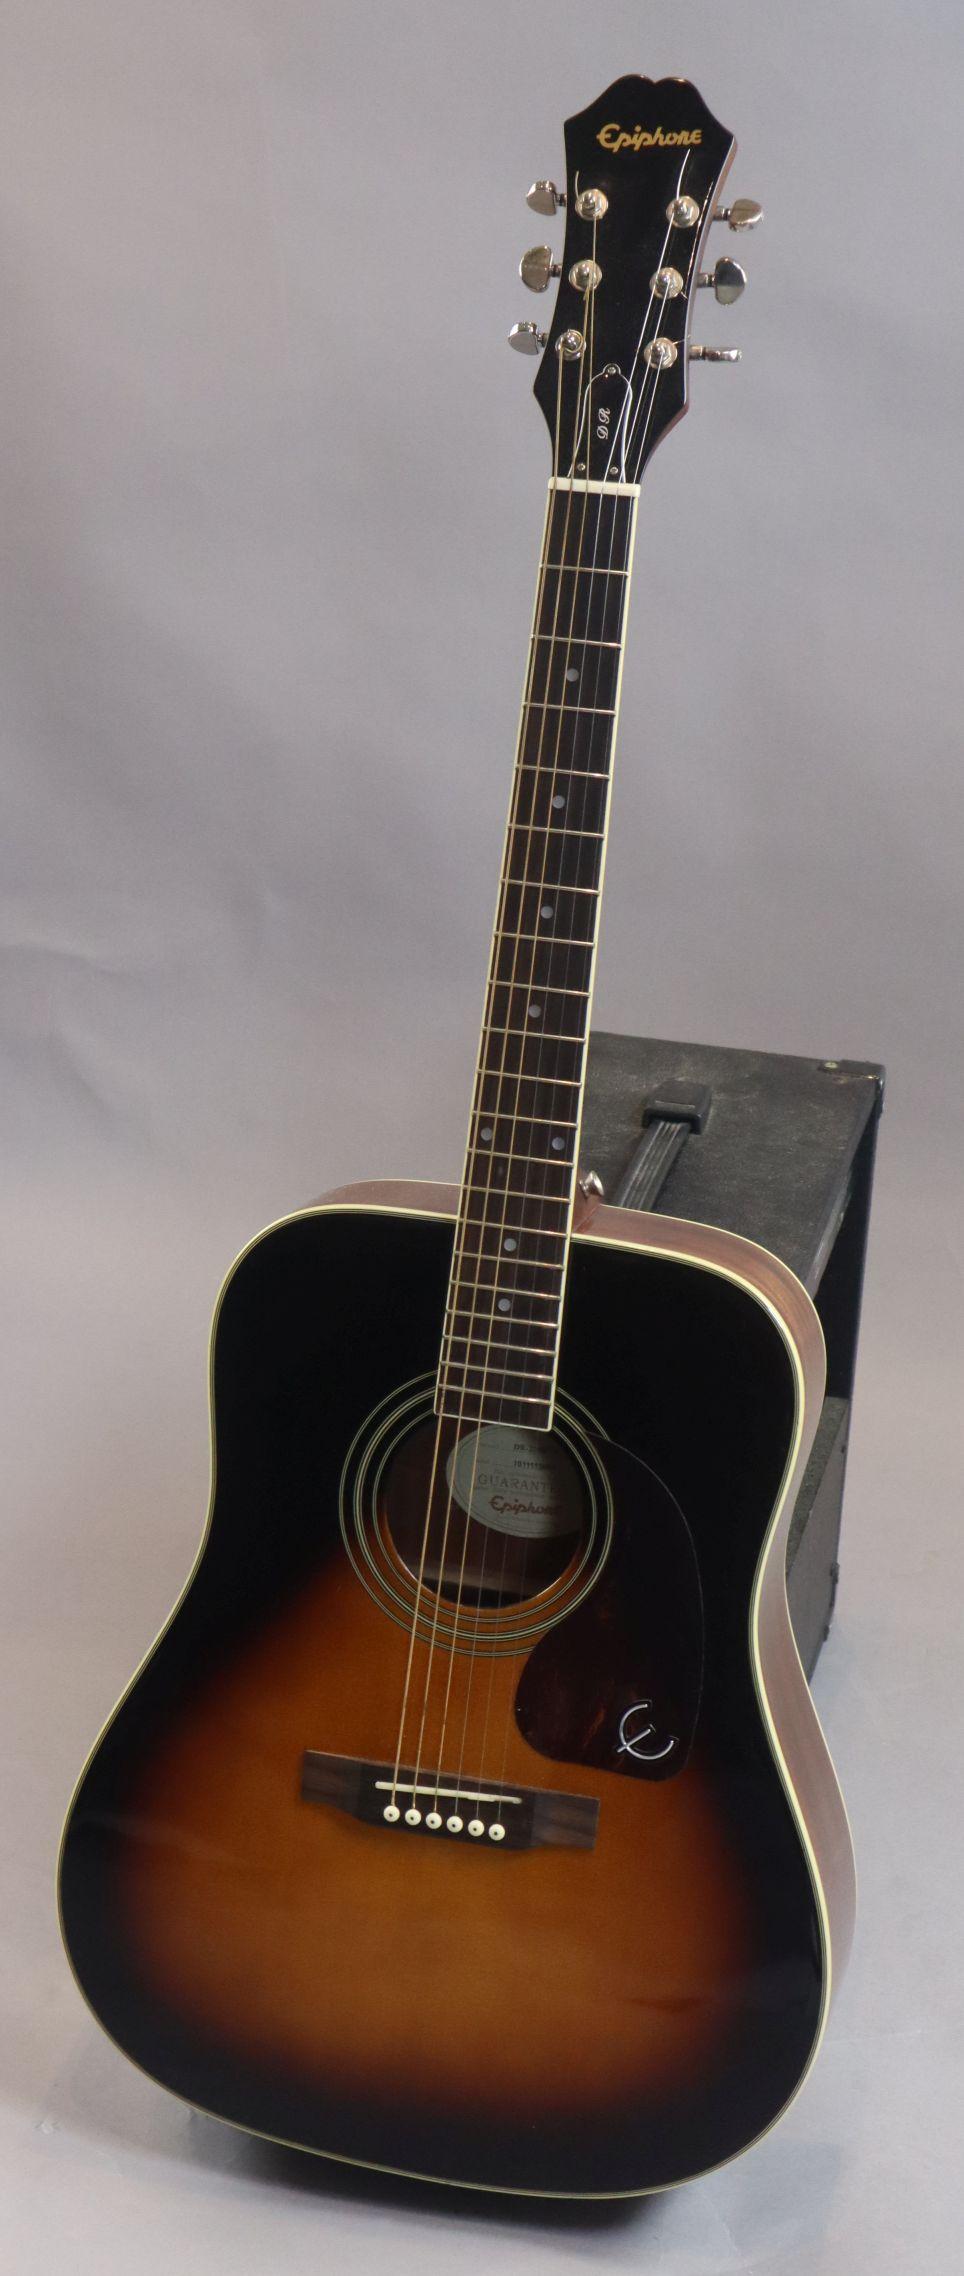 Lot 124 - An Epiphone D R 220 vintage sunburst Dreadnought acoustic guitar, with padded bag